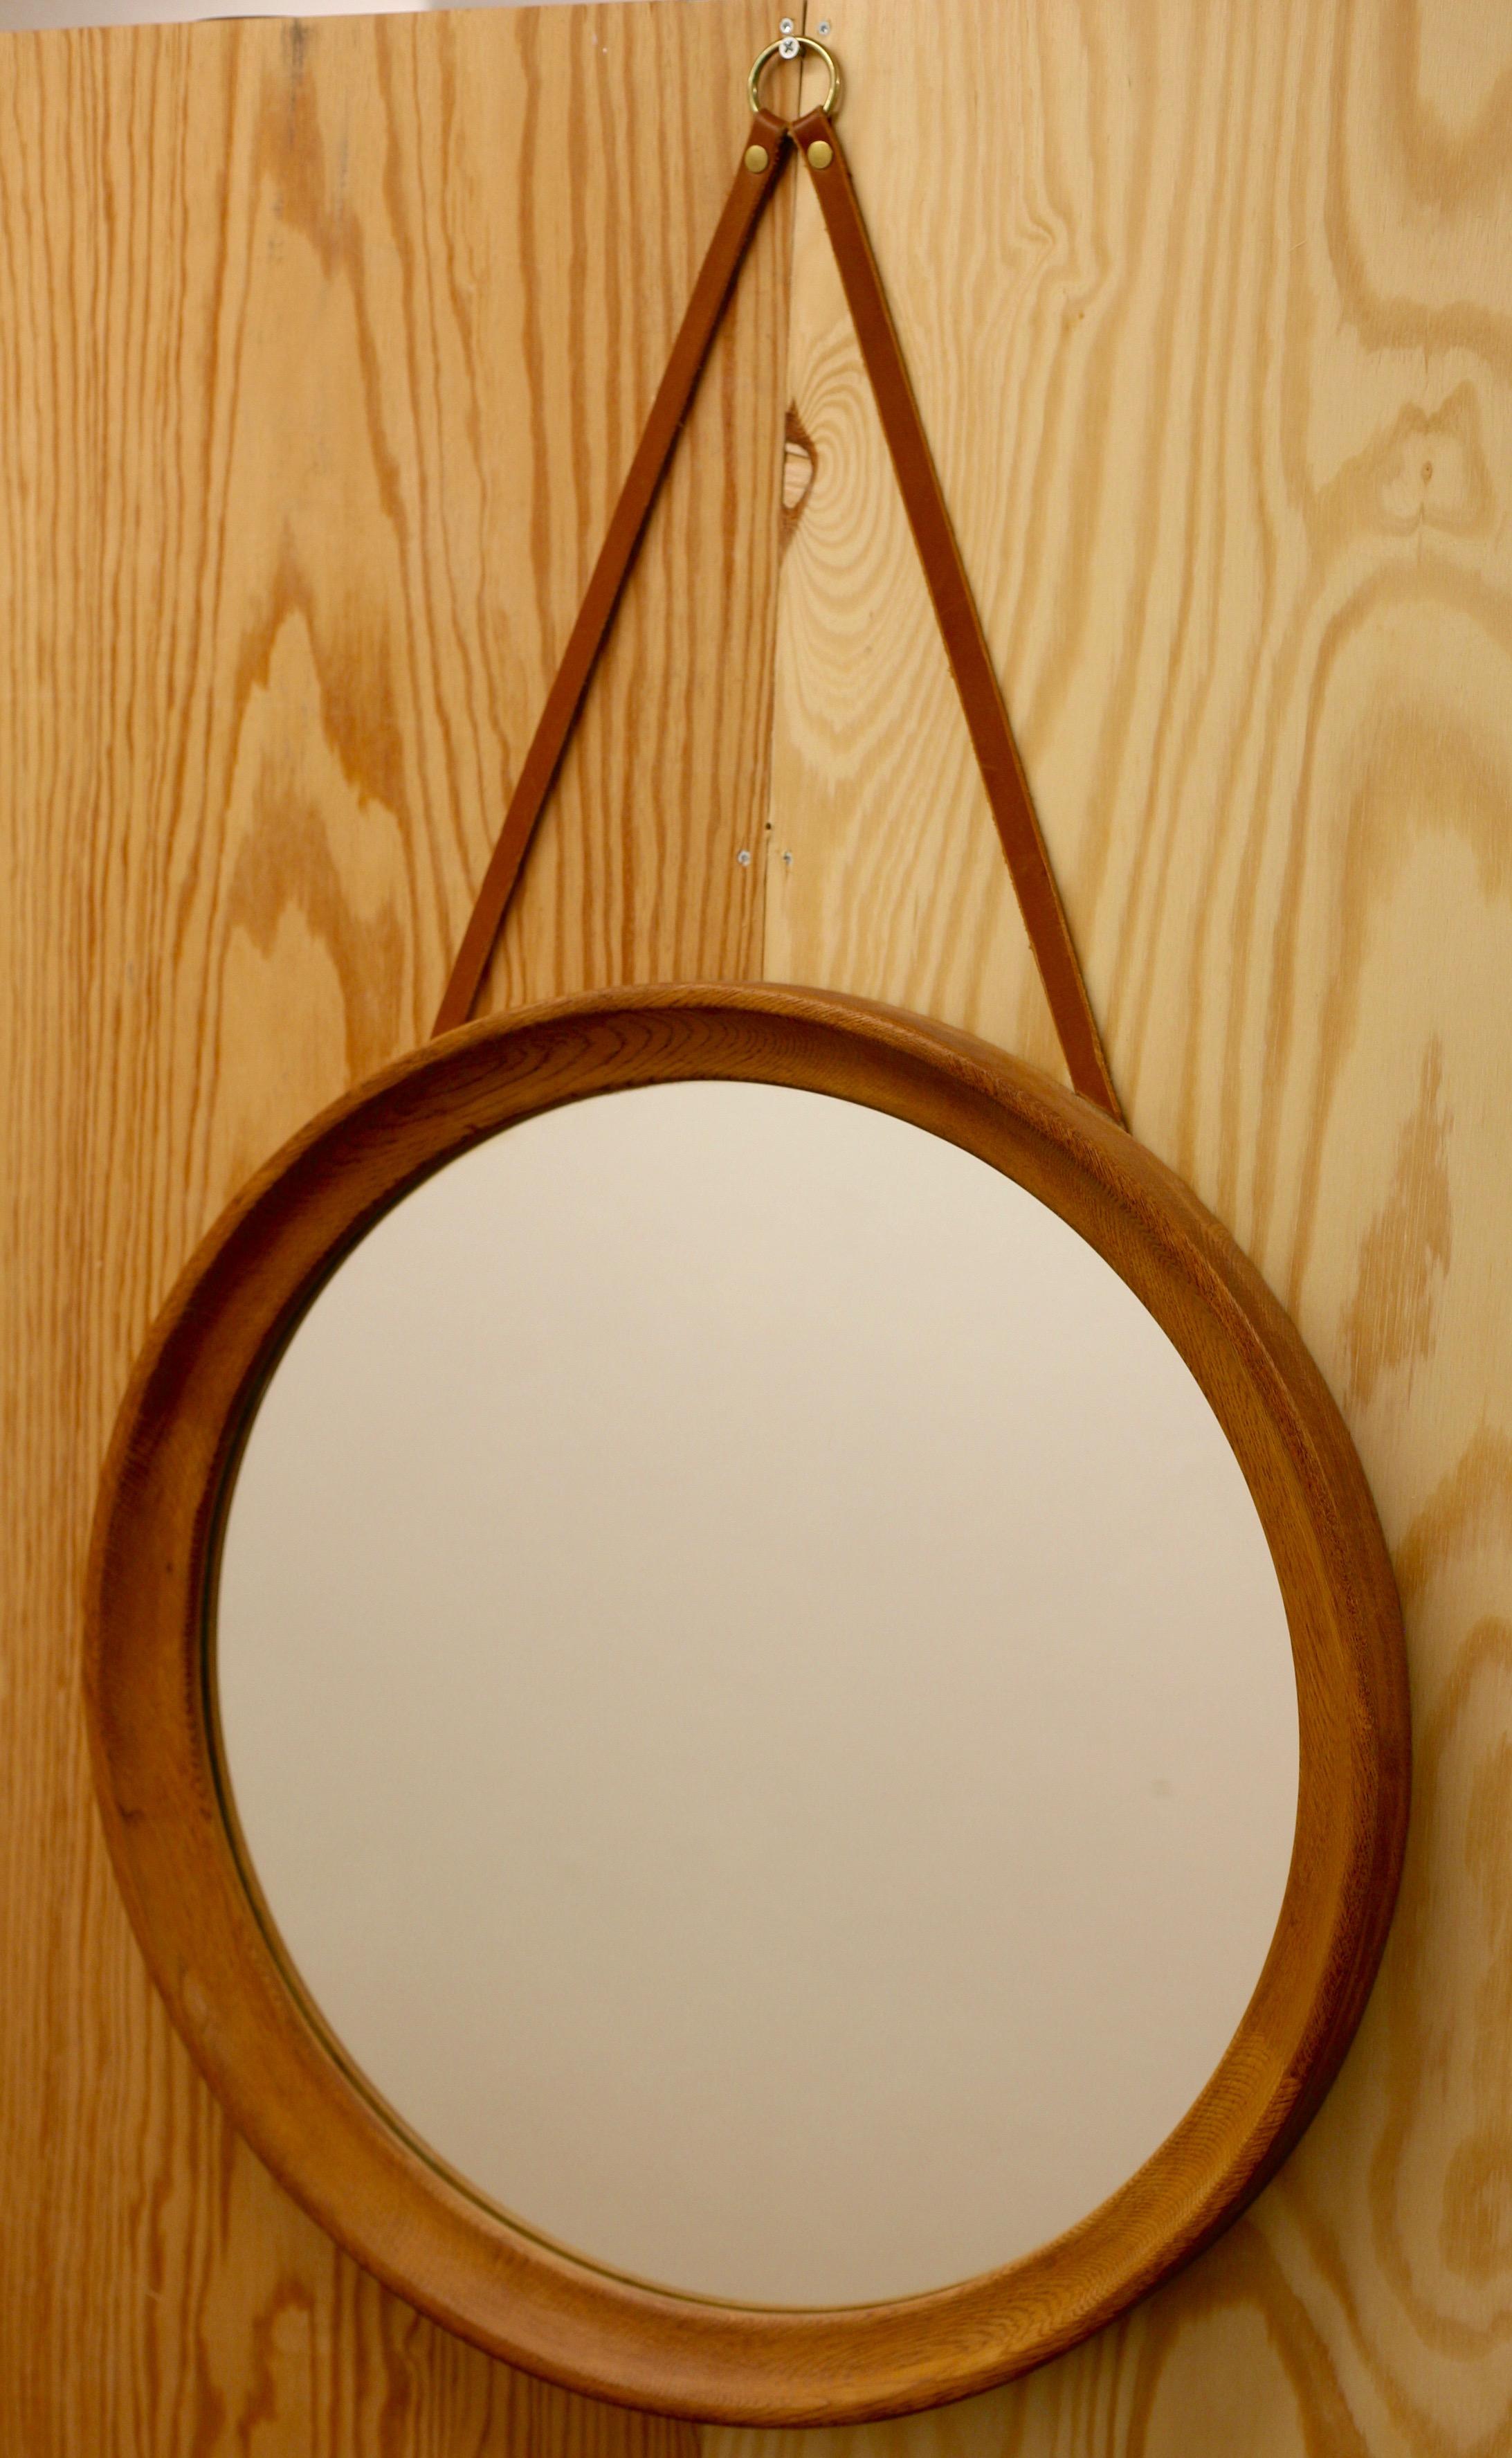 Uno & Östen Kristiansson (Luxus) - Oak mirror